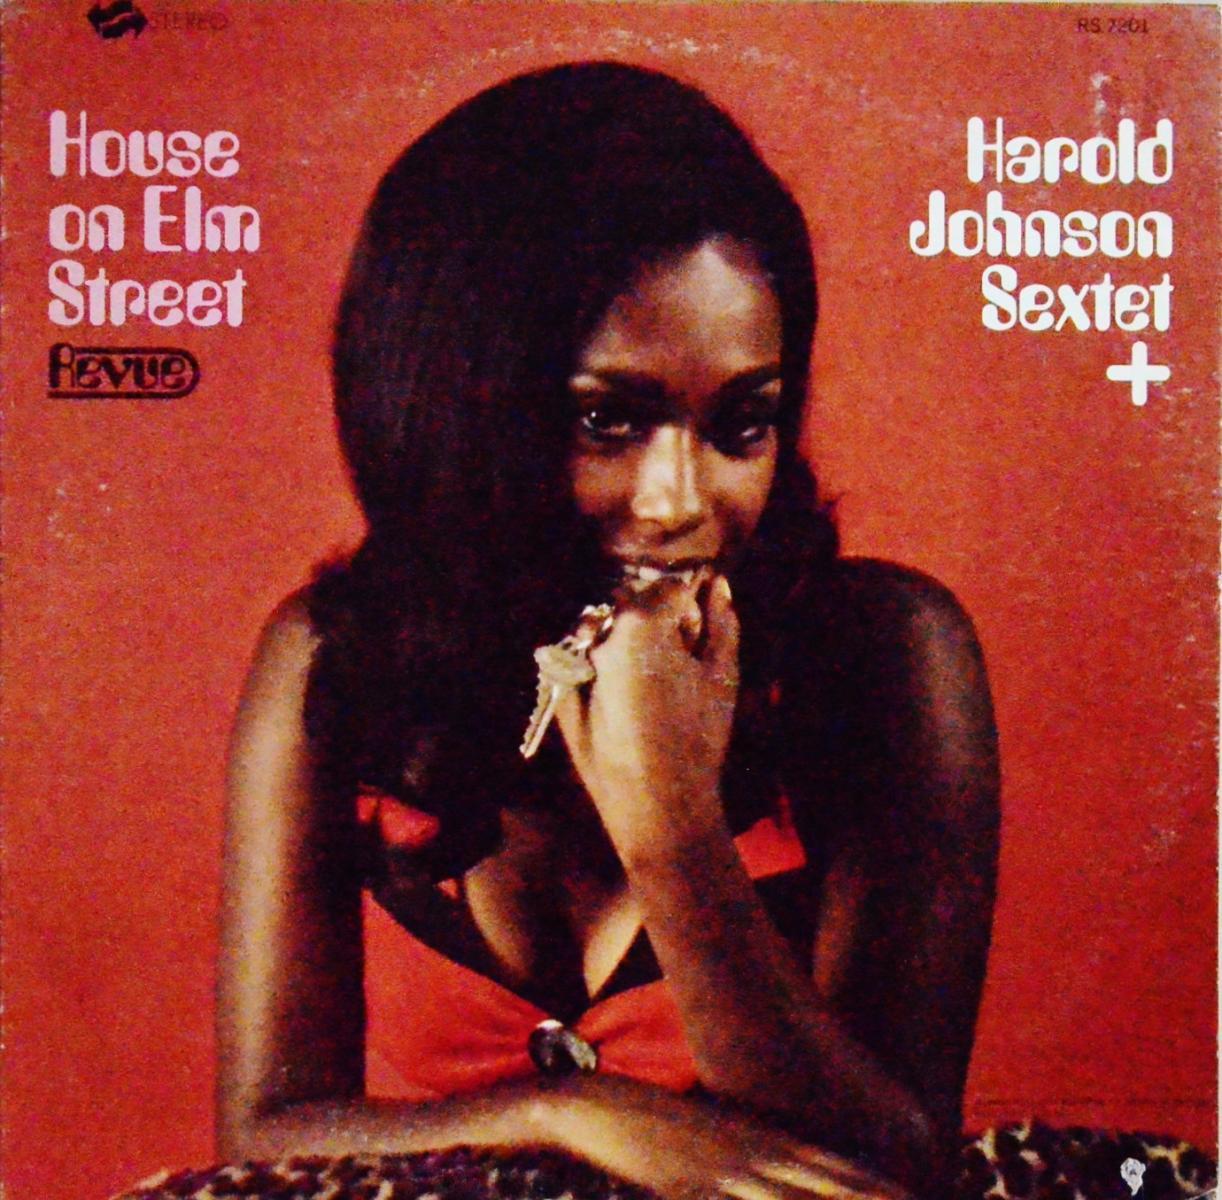 HAROLD JOHNSON SEXTET+ / HOUSE ON ELM STREET (LP)